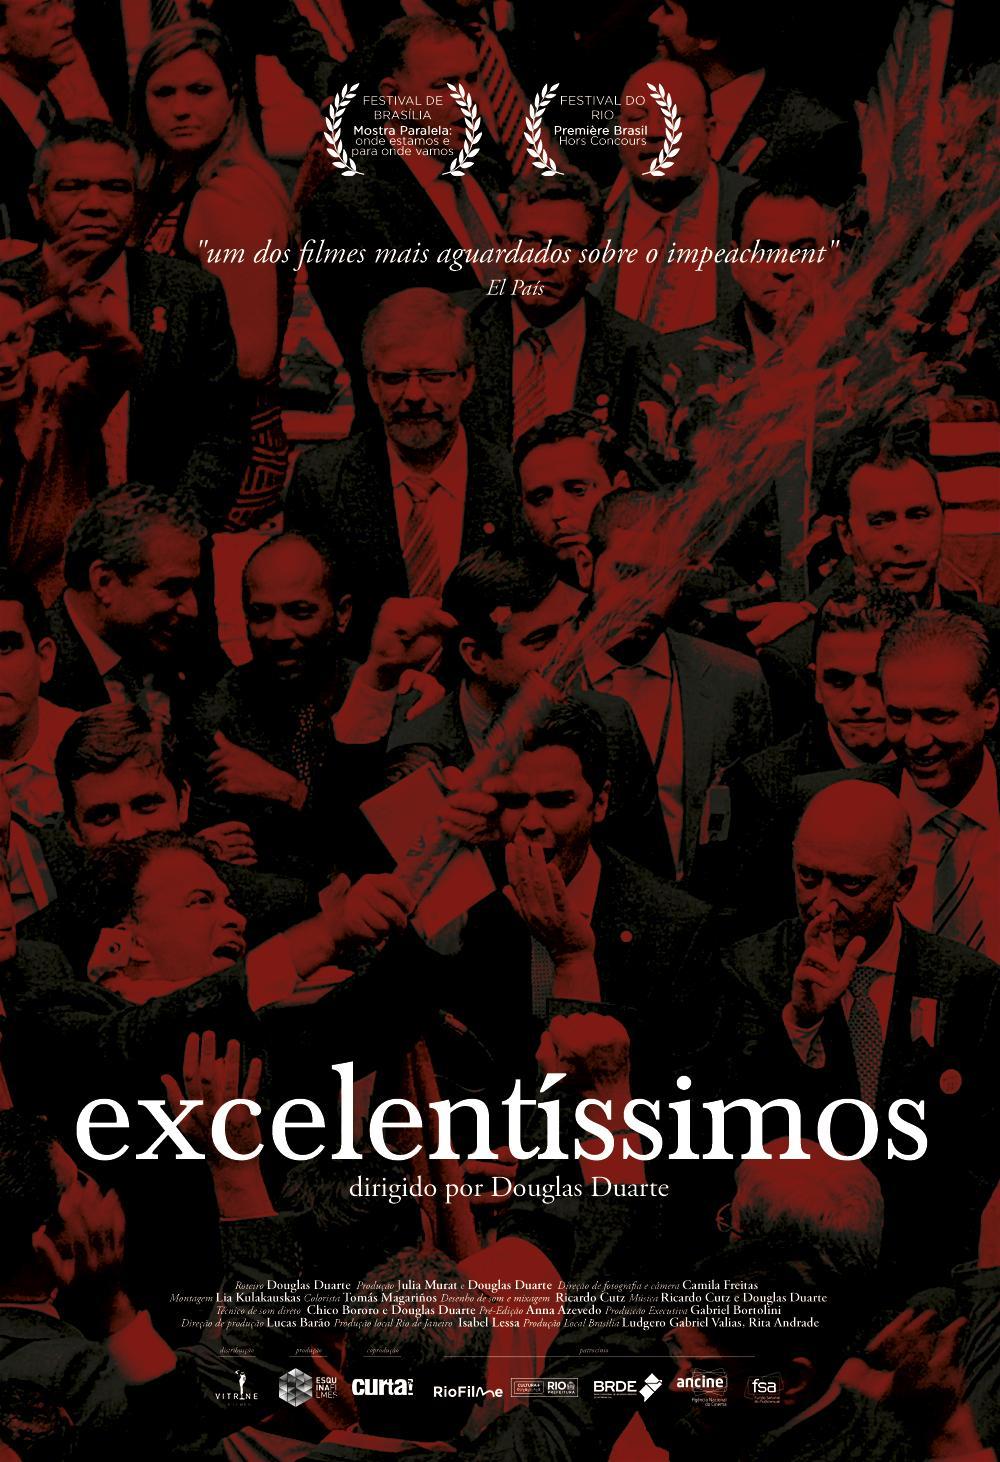 Excelentíssimos [Nac] – IMDB 6.1